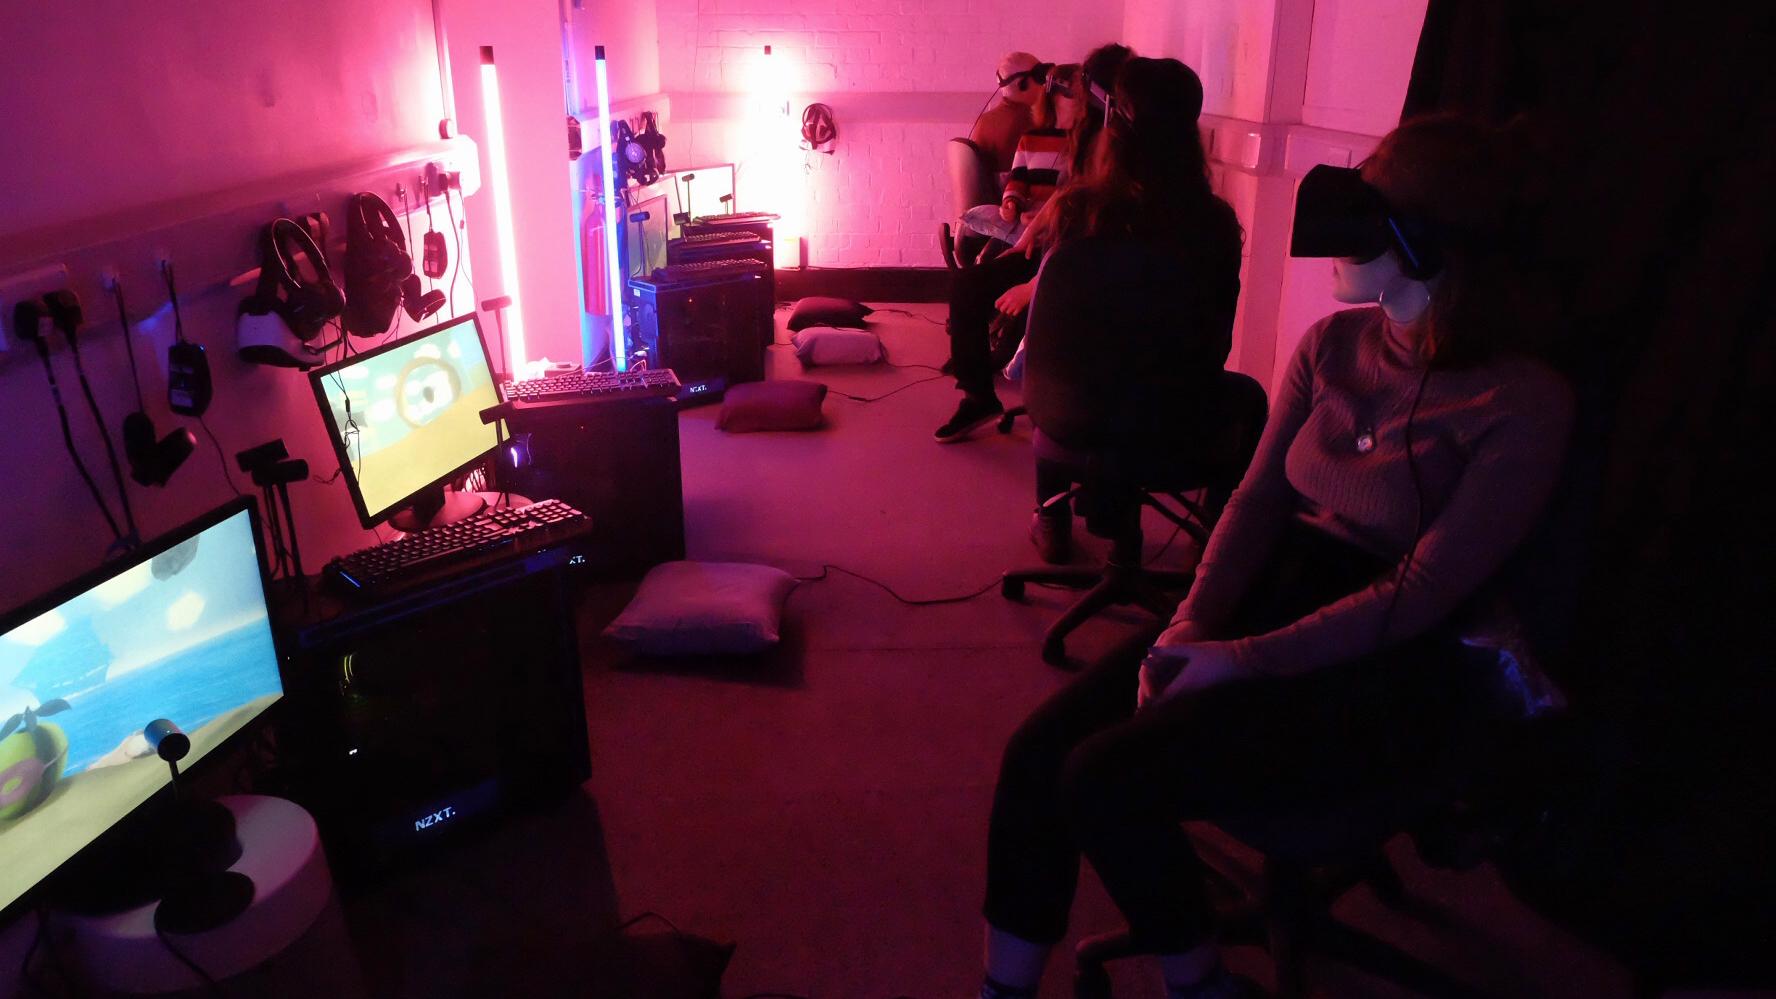 Limina Immersive VR arts event